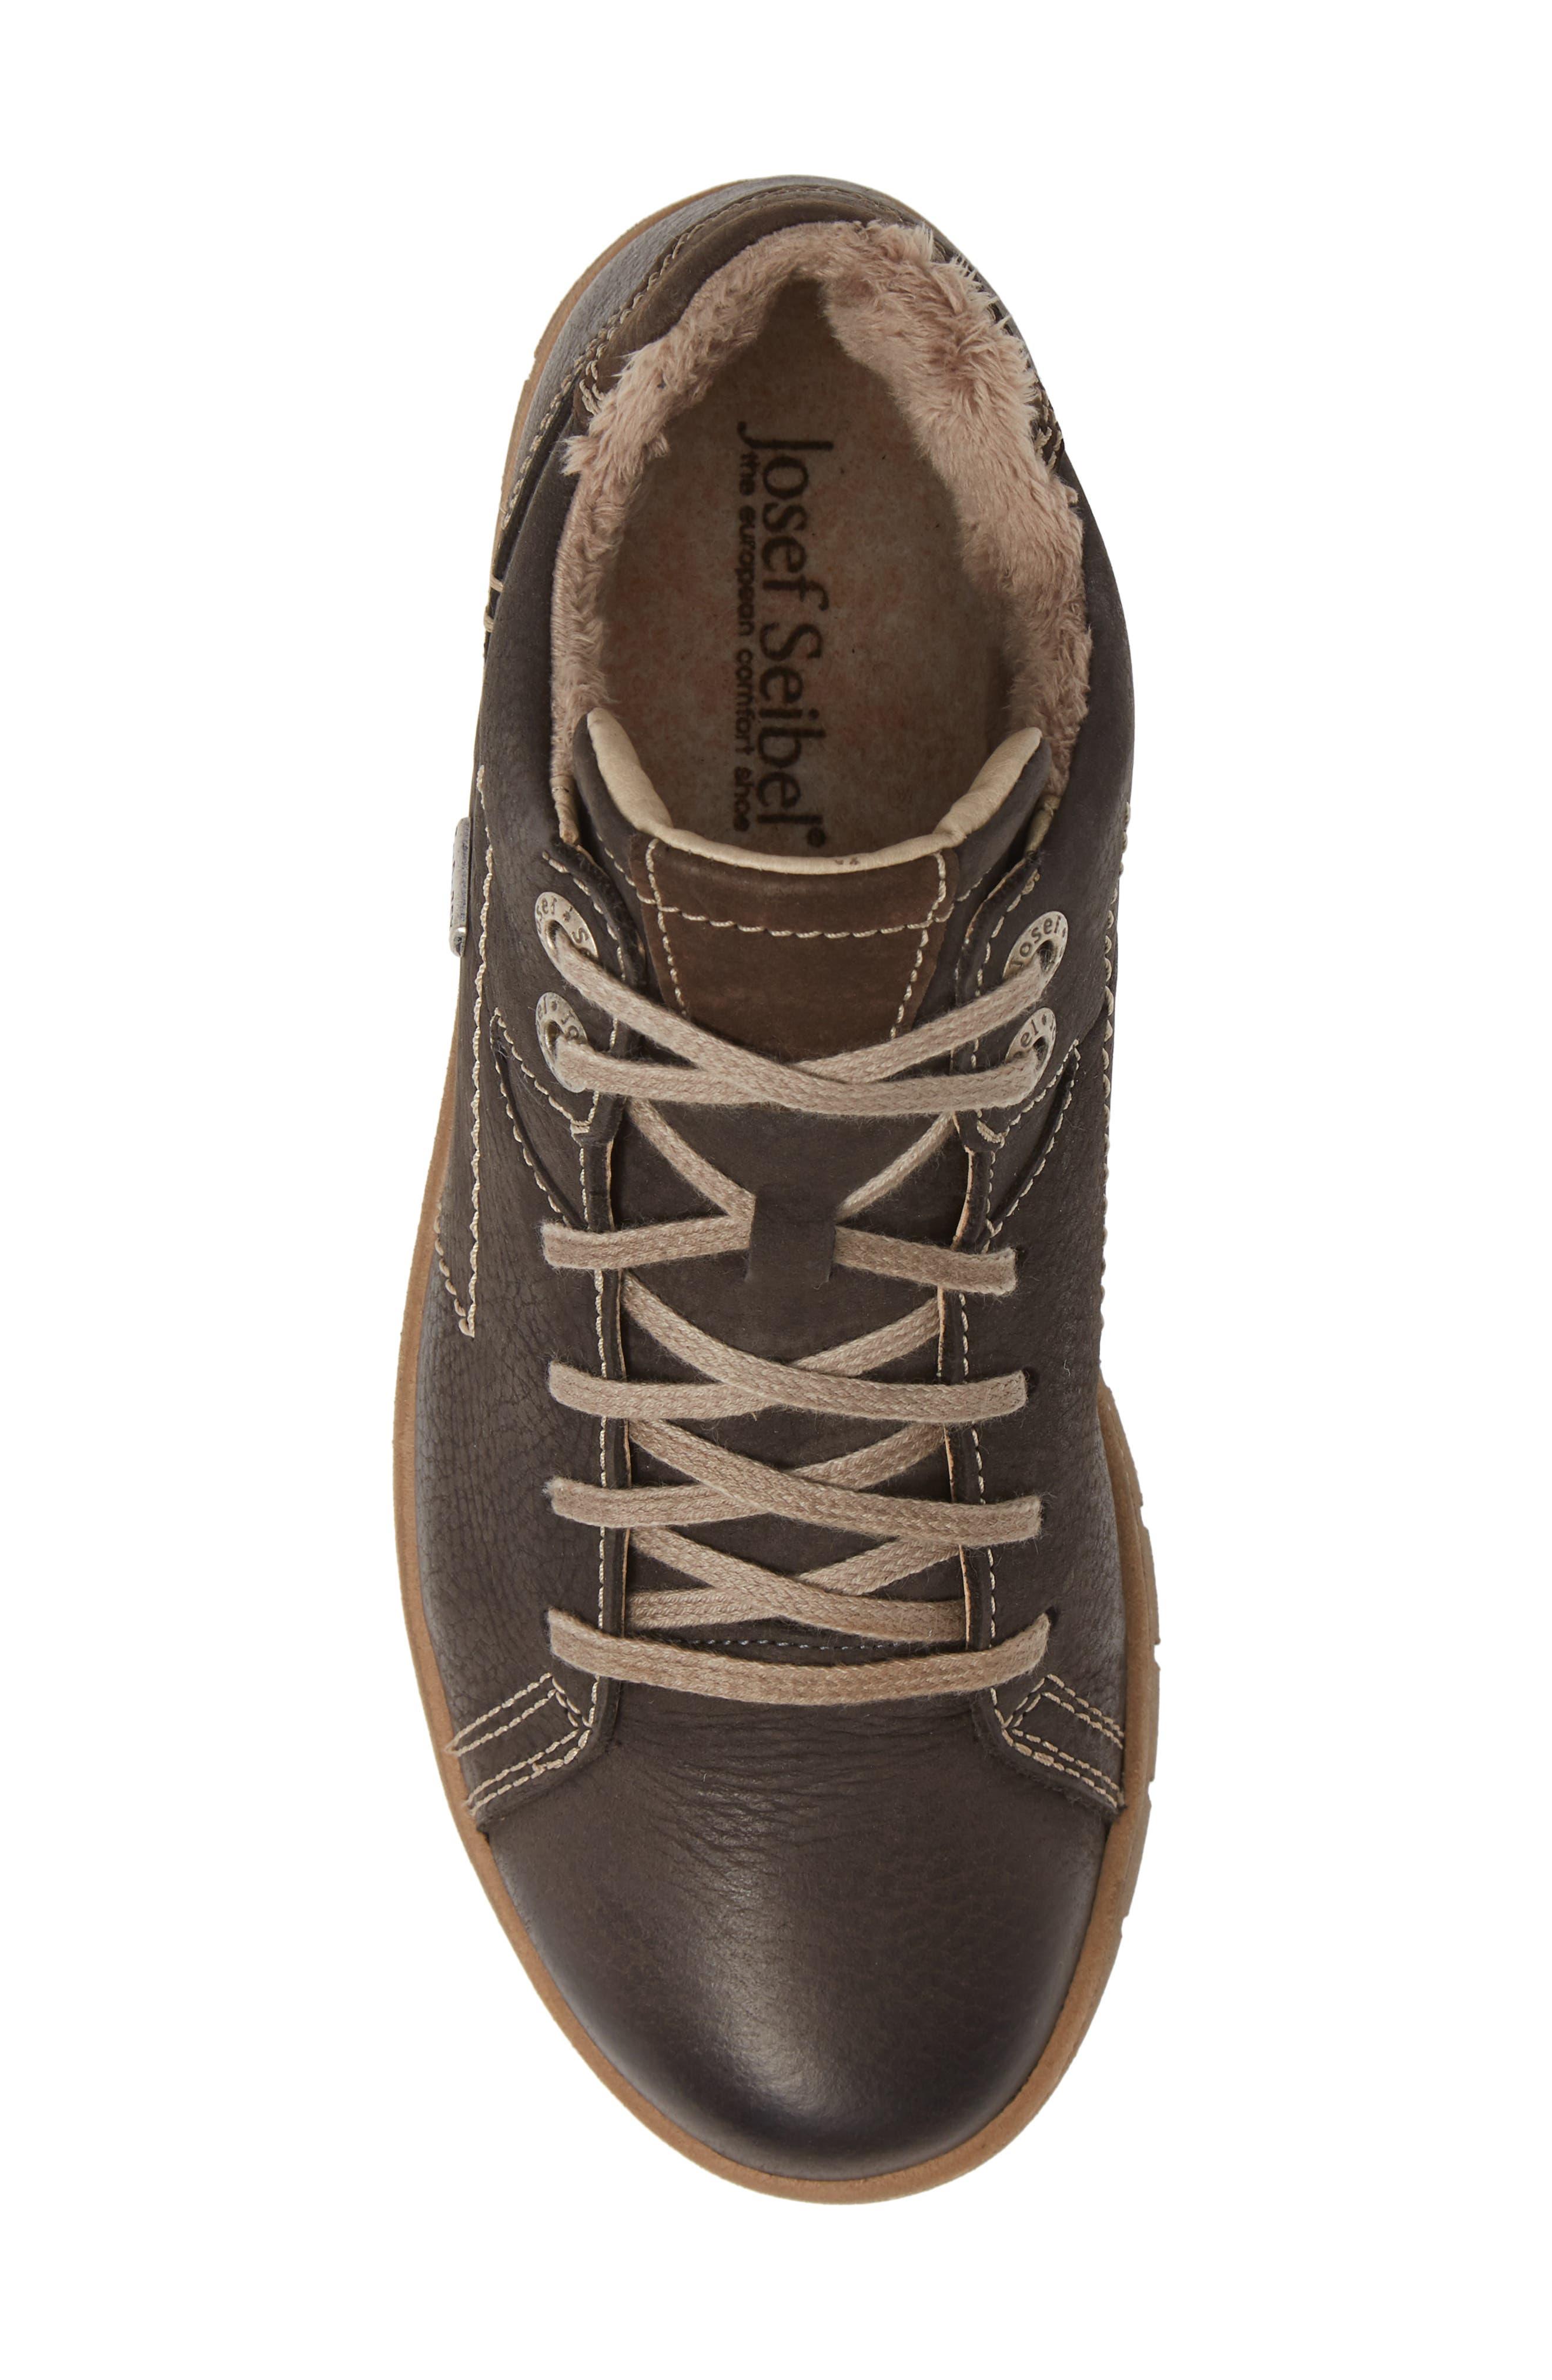 Steffi 58 Sneaker Bootie,                             Alternate thumbnail 5, color,                             TITAN LEATHER